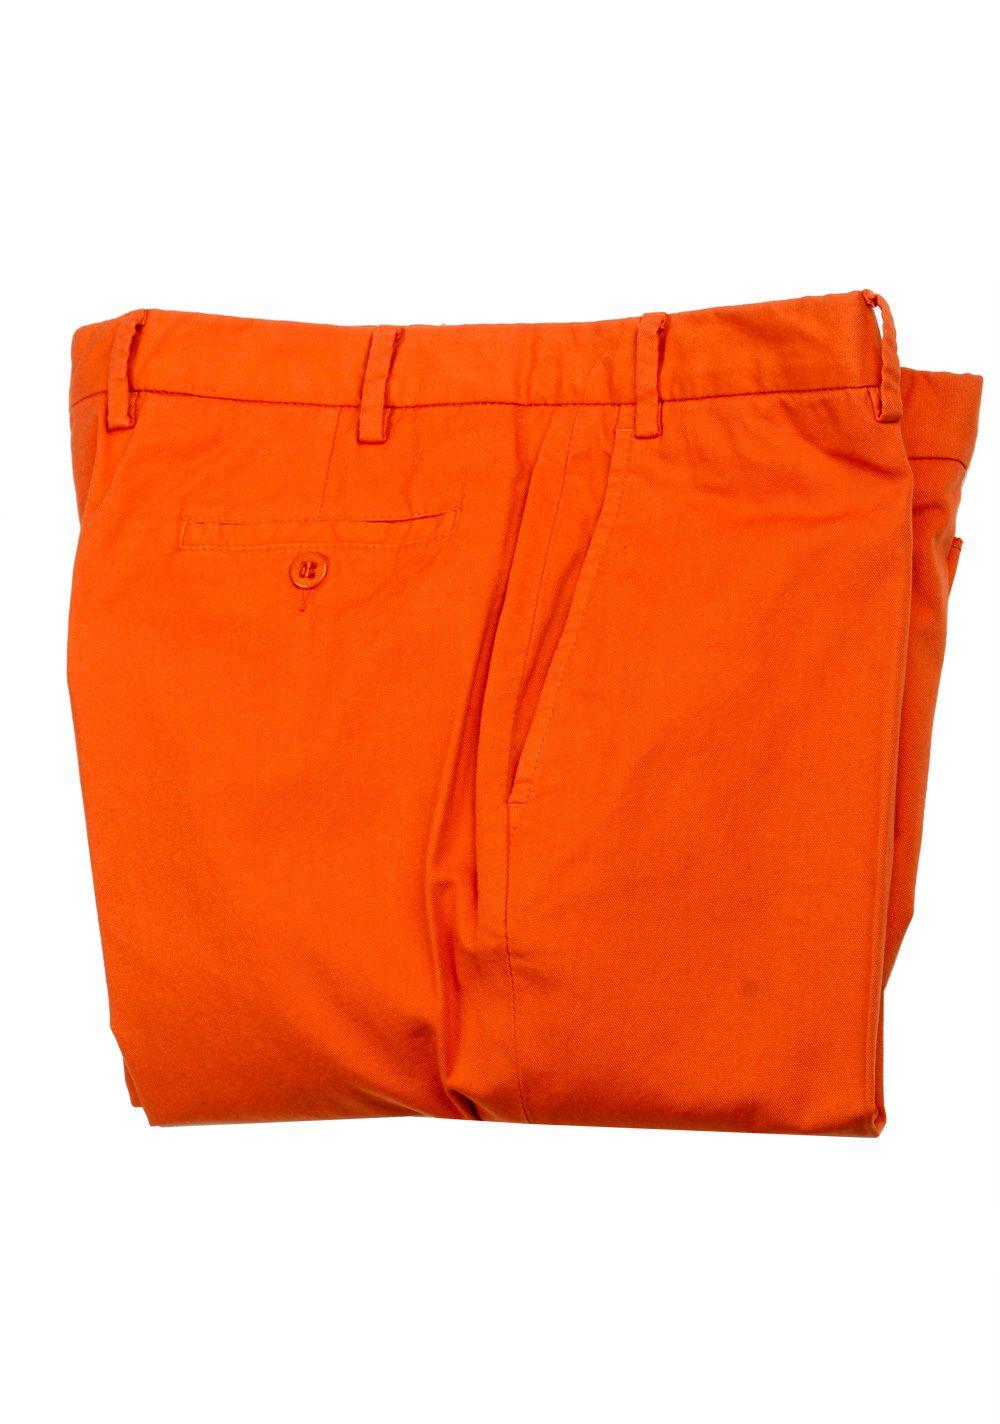 Caruso Orange Trousers Size 54 / 38 U.S. | Costume Limité